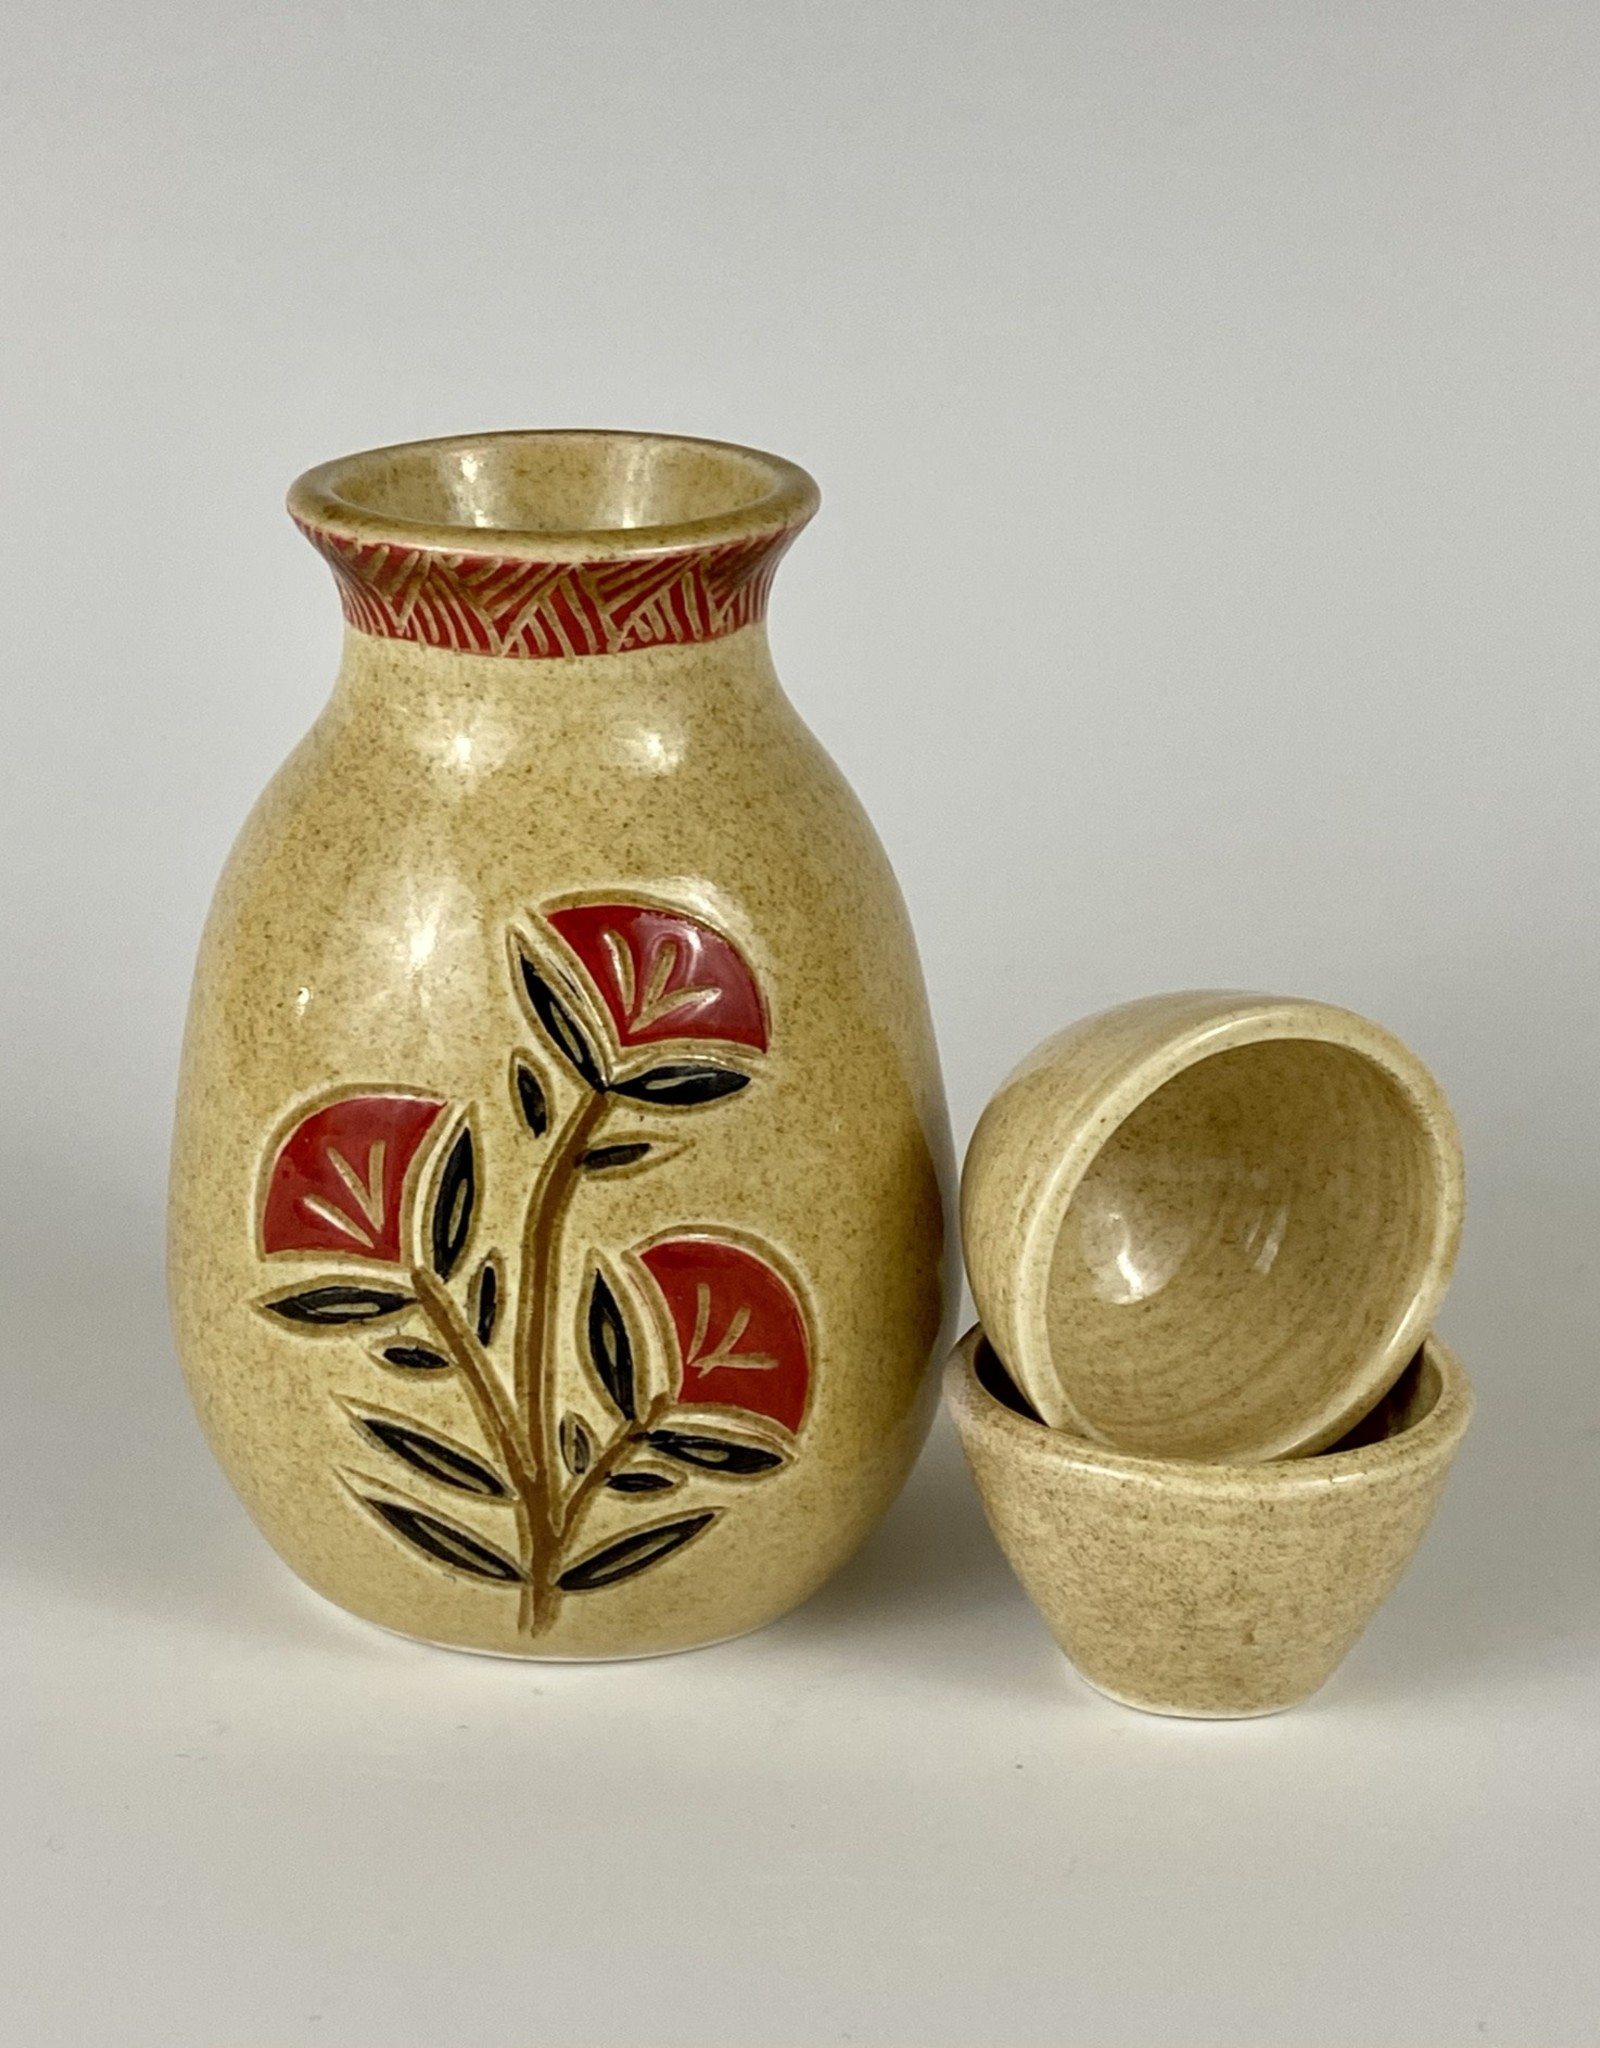 Anshula Tayal Amaati Sake bottle and 2 cups